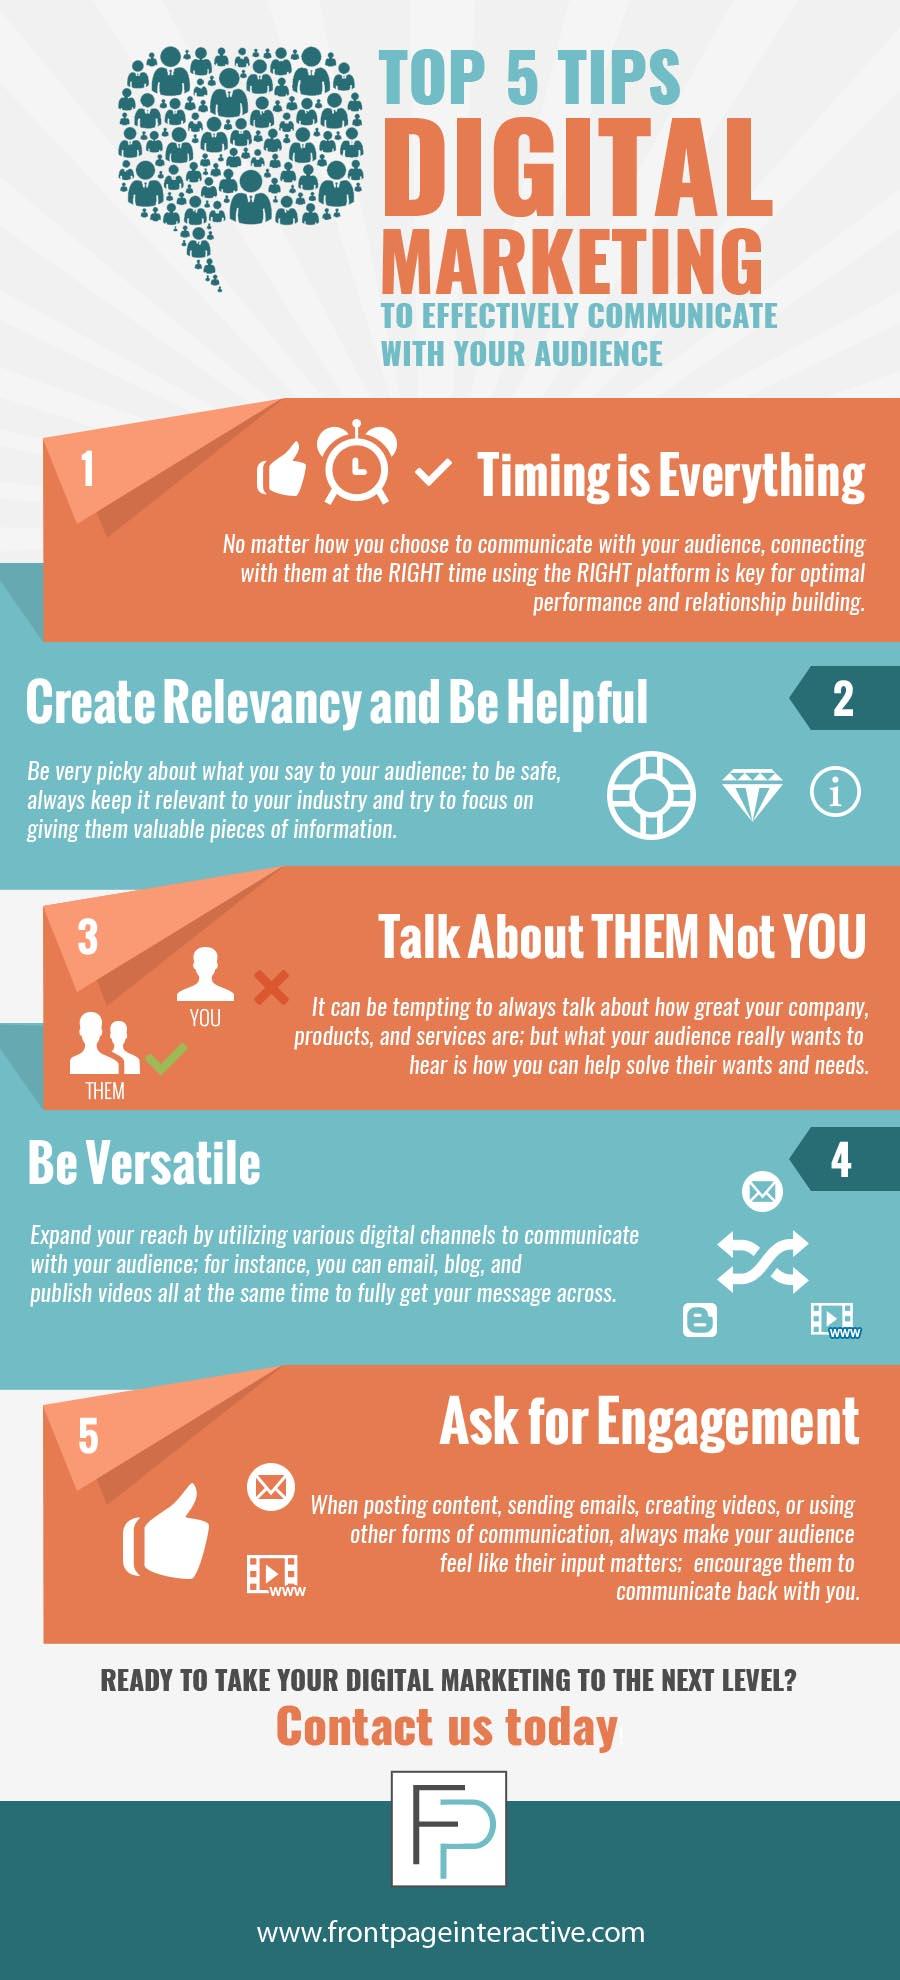 5 digital marketing tips for communication